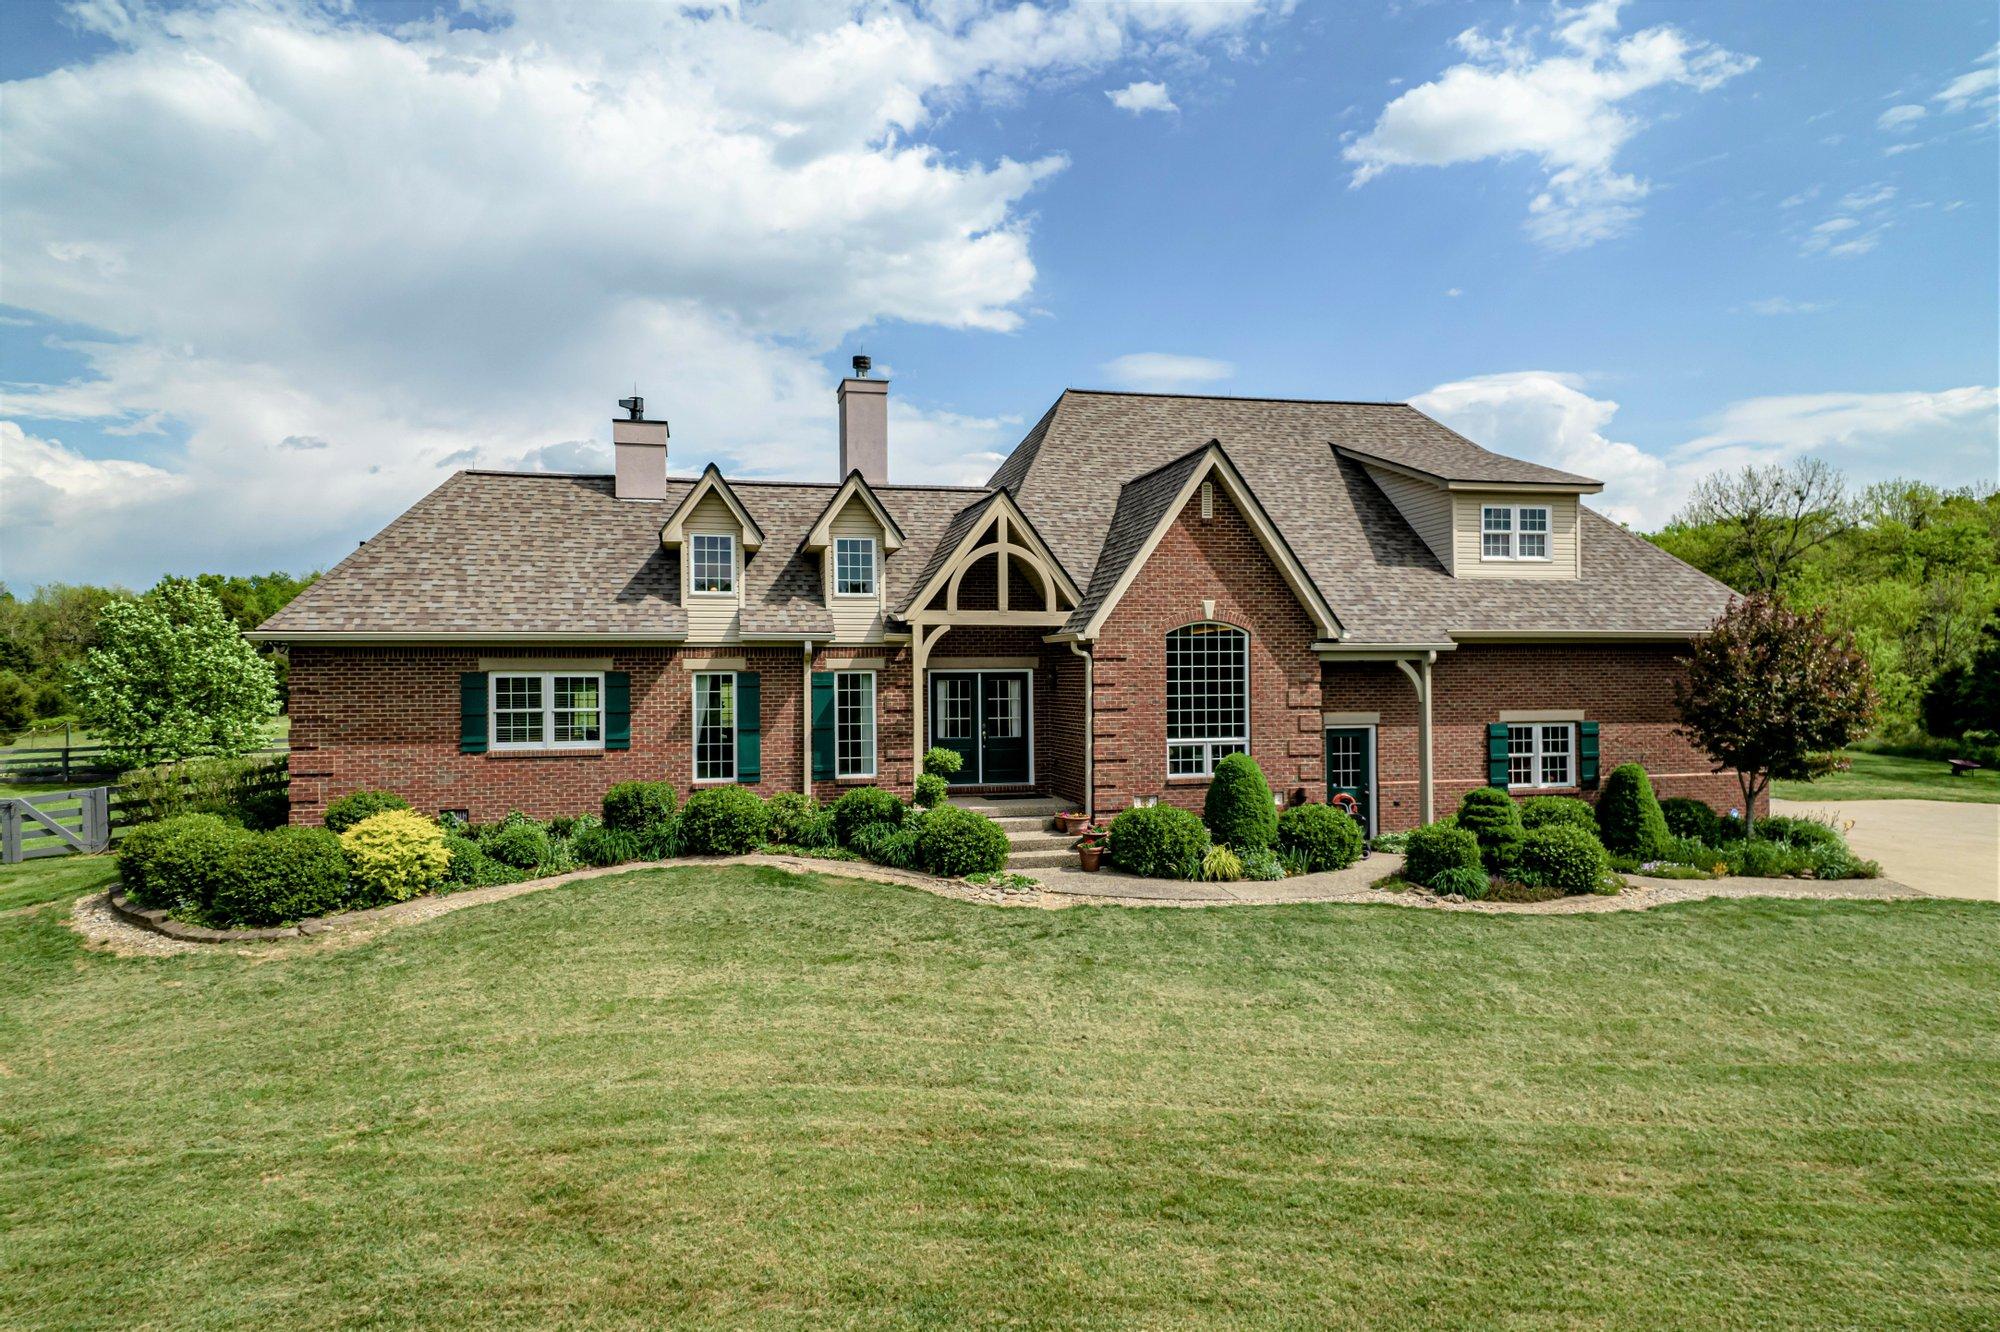 Casa a Coxs Creek, Kentucky, Stati Uniti 1 - 11445865